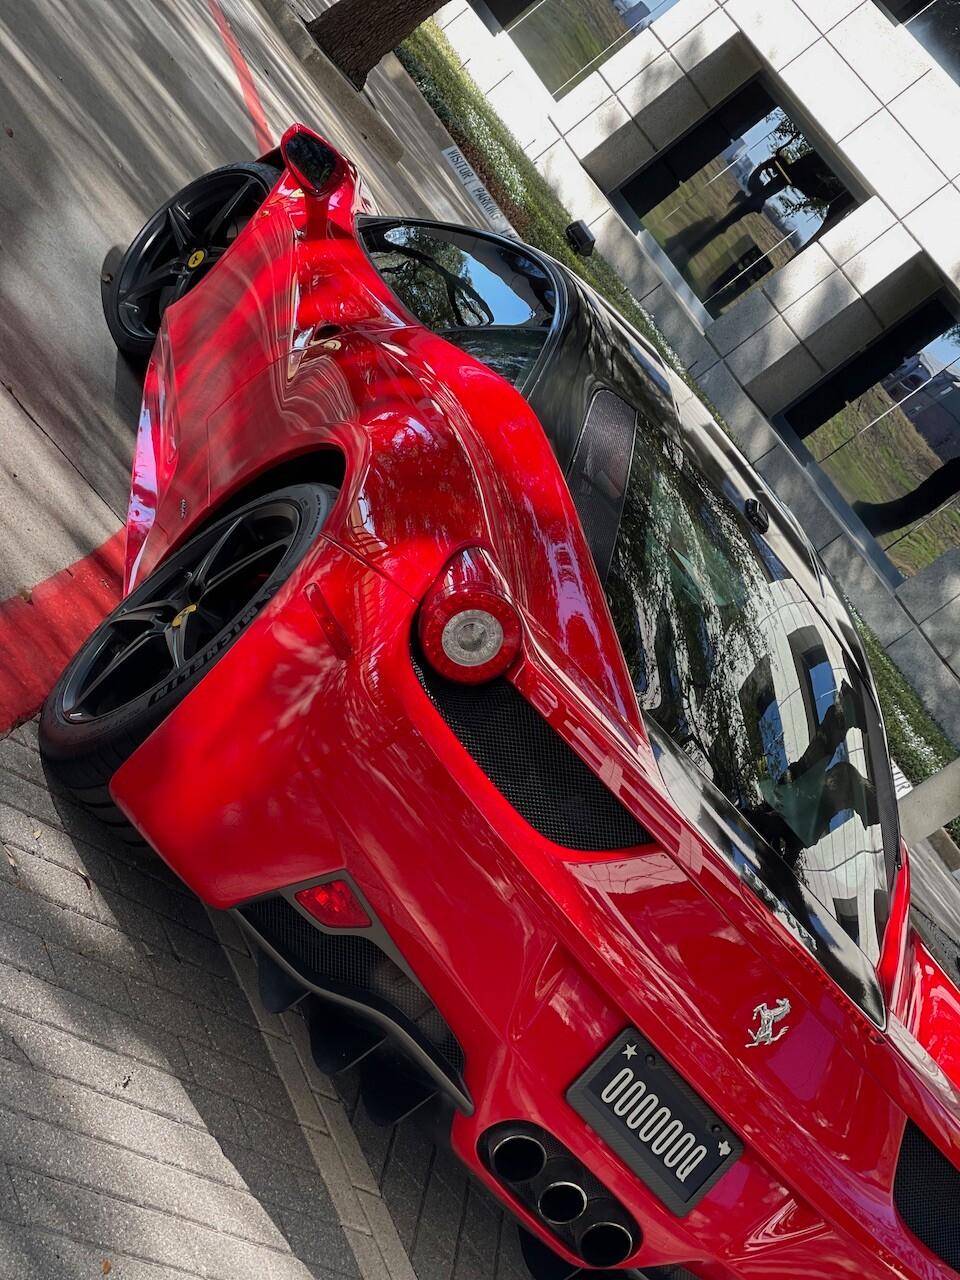 2010 Ferrari  458 Italia image IMG_4558.JPG